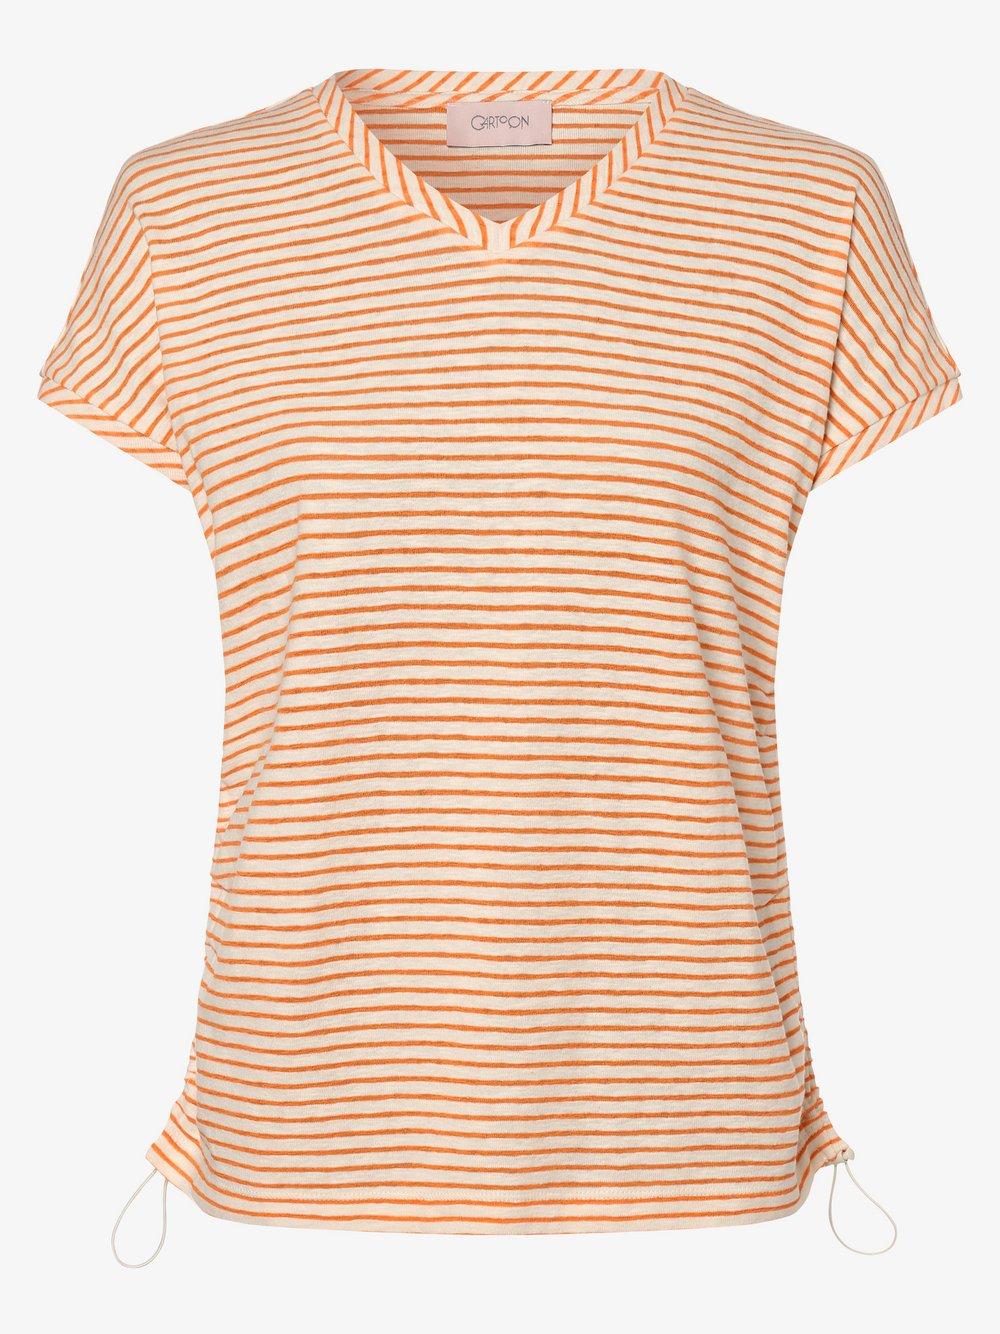 Cartoon UPgreat! – T-shirt damski, pomarańczowy Van Graaf 487180-0001